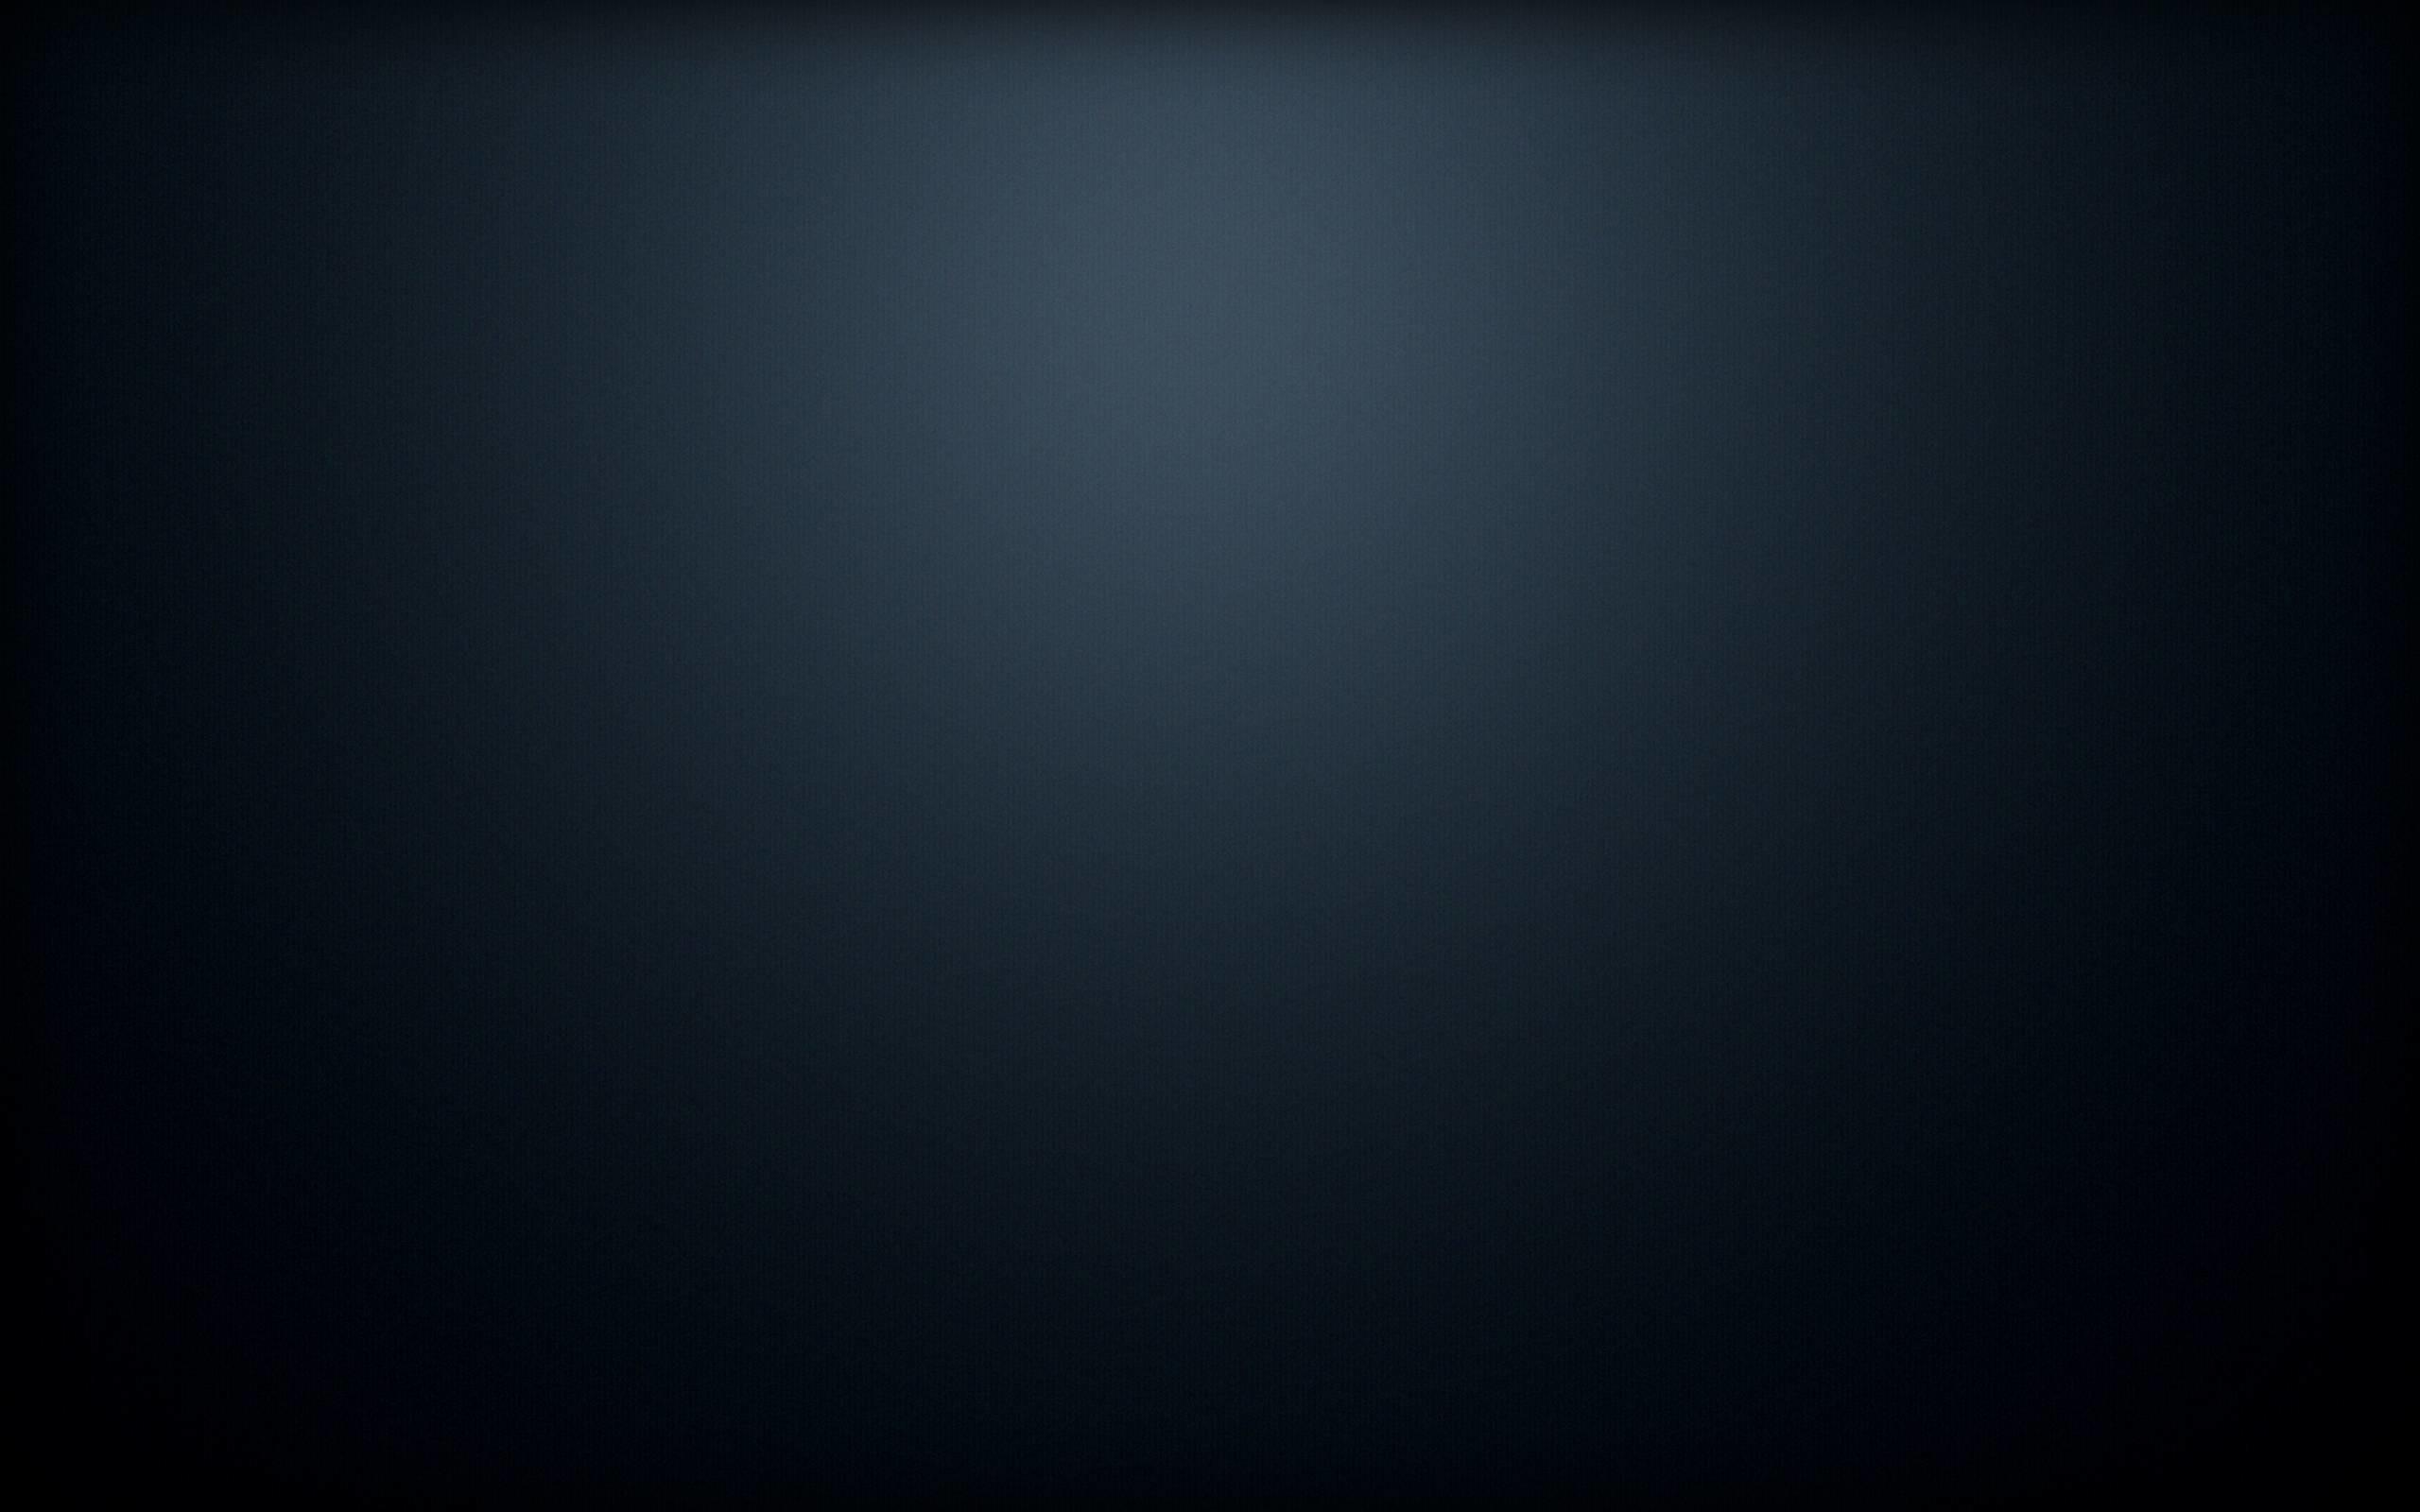 Blue Hd Wallpaper: Dark Blue Hd Wallpaper #2266 |.Ssofc